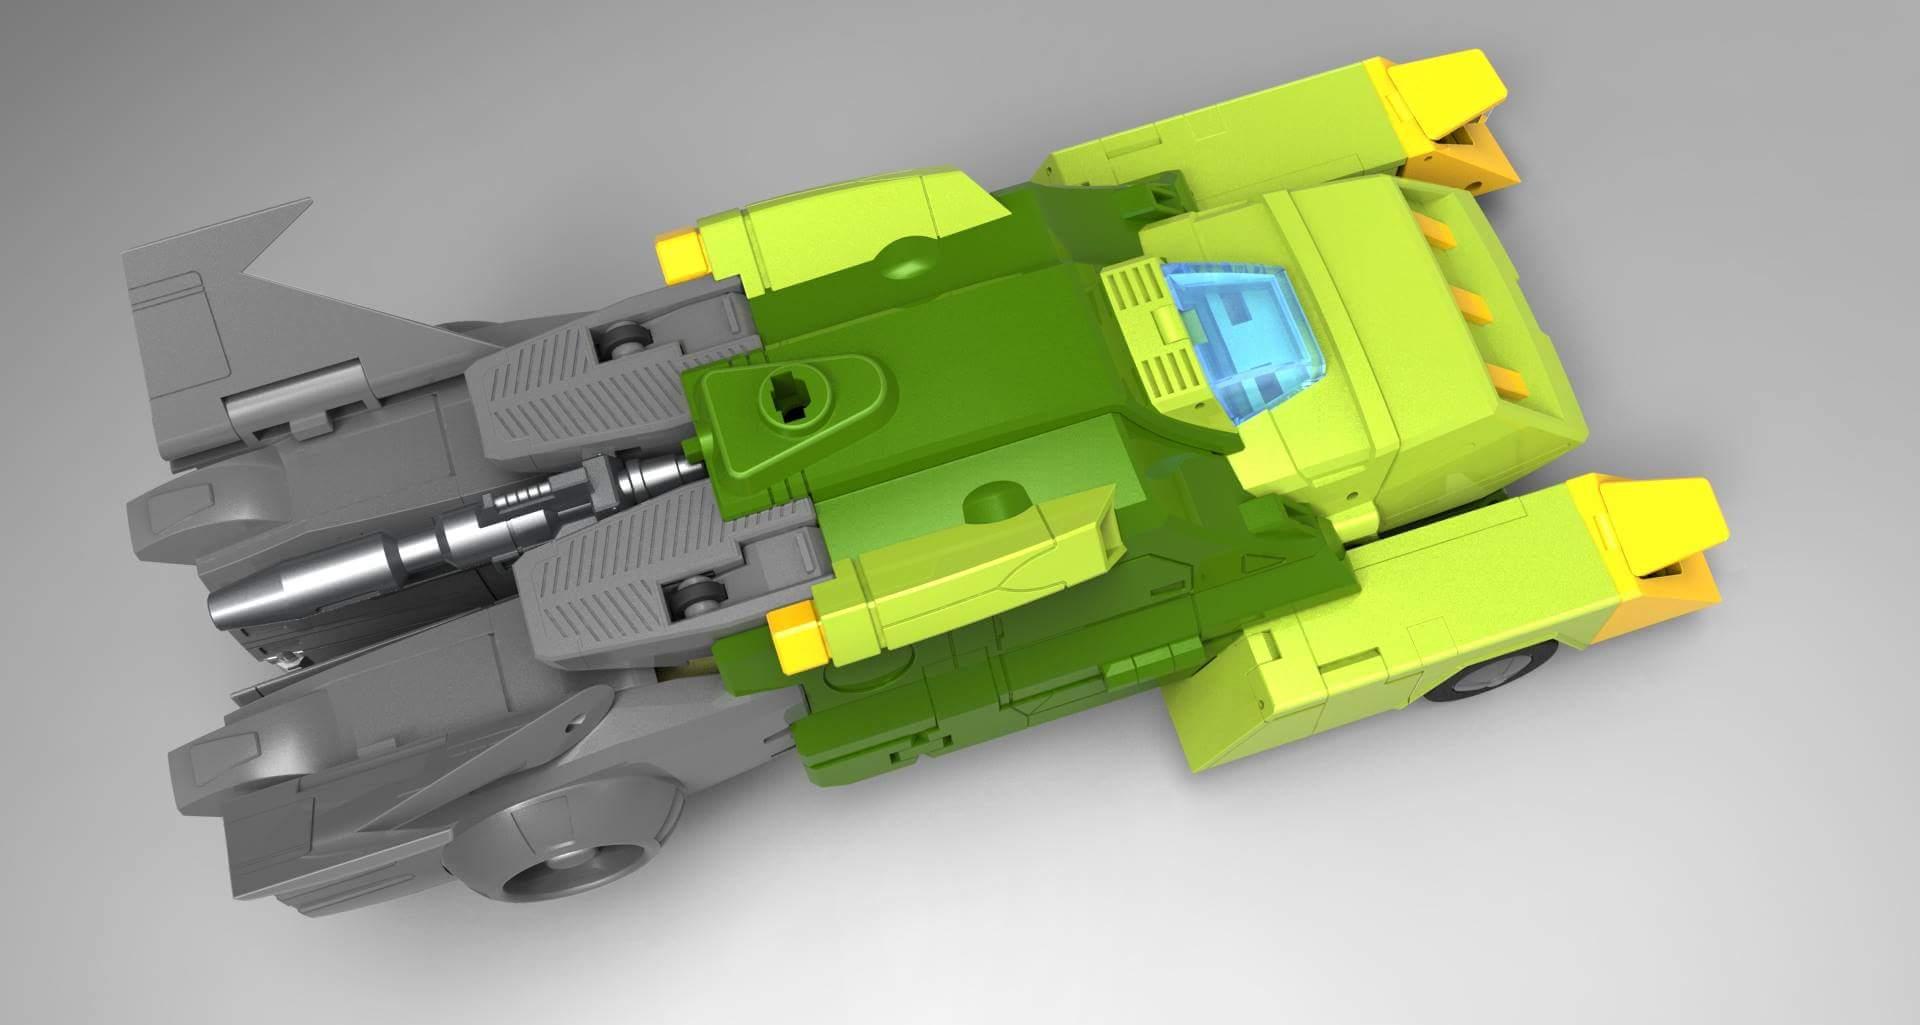 [X-Transbots] Produit Tiers - Jouets MX-10 Virtus - aka Springer/Ricochet XGv3XfEi